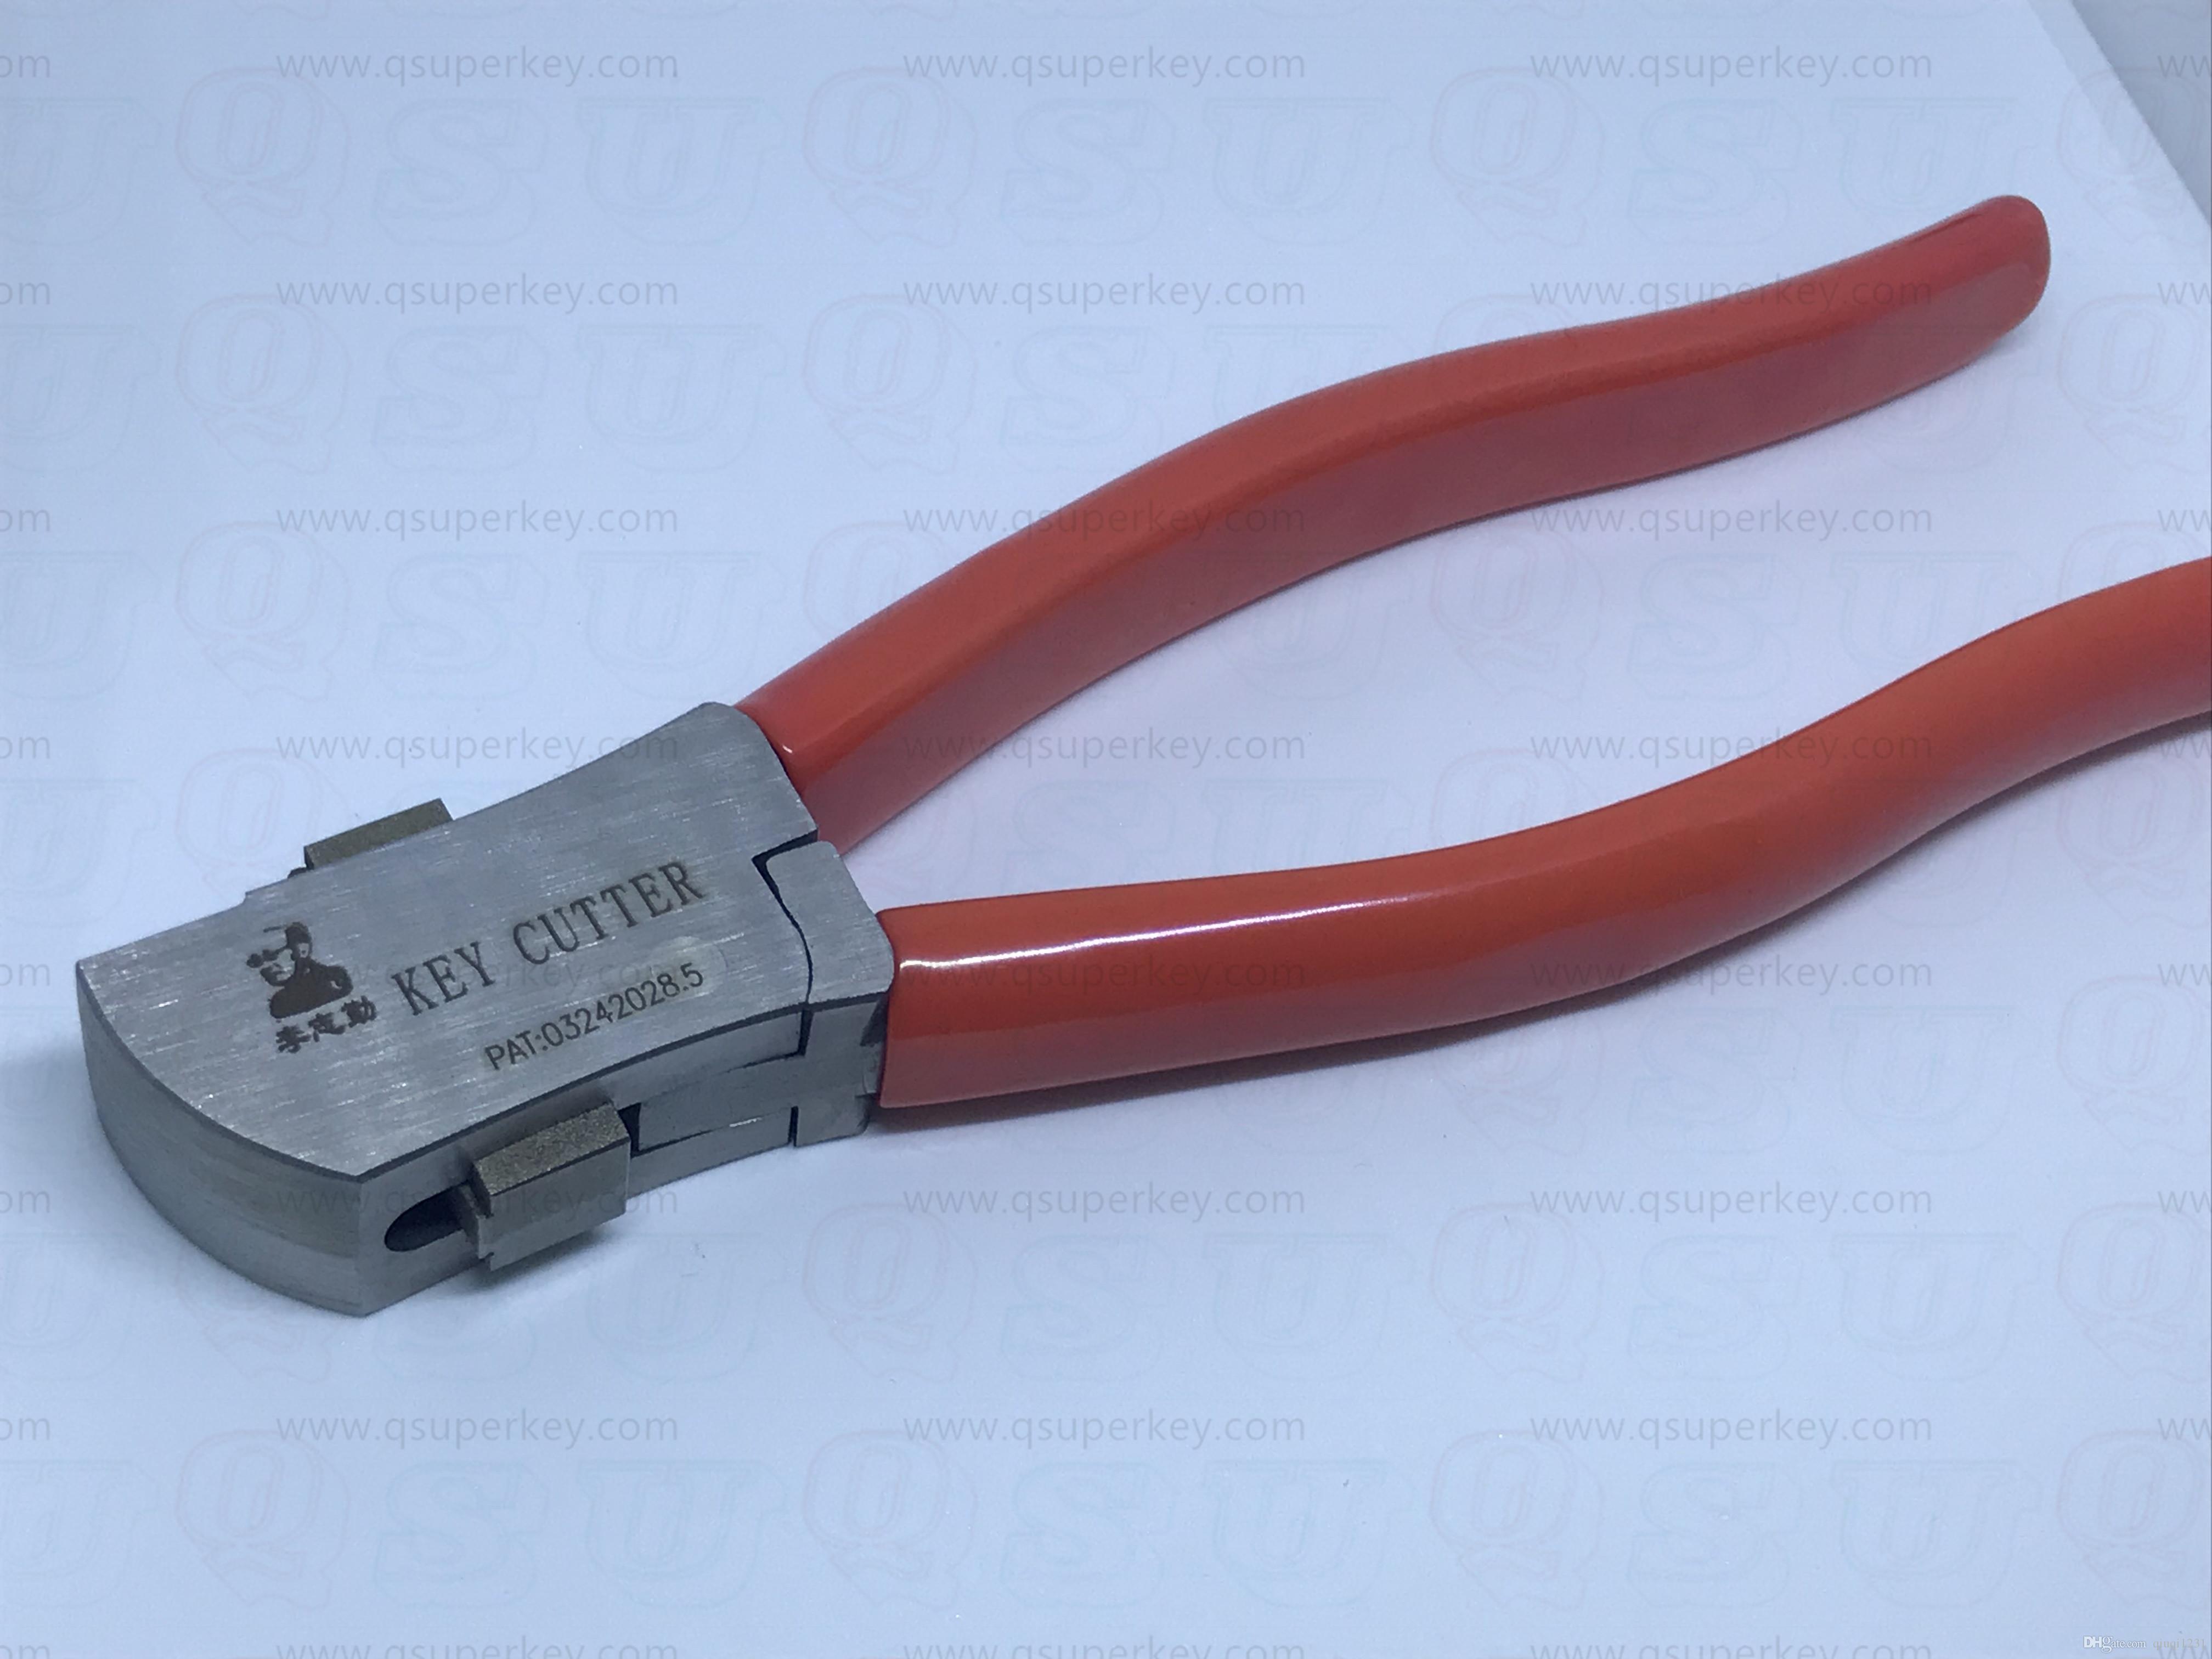 qsuperkey 핫 세일 Lishi 키 커터 자동 키 커팅 머신 자물쇠 선택 세트 자물쇠 도구